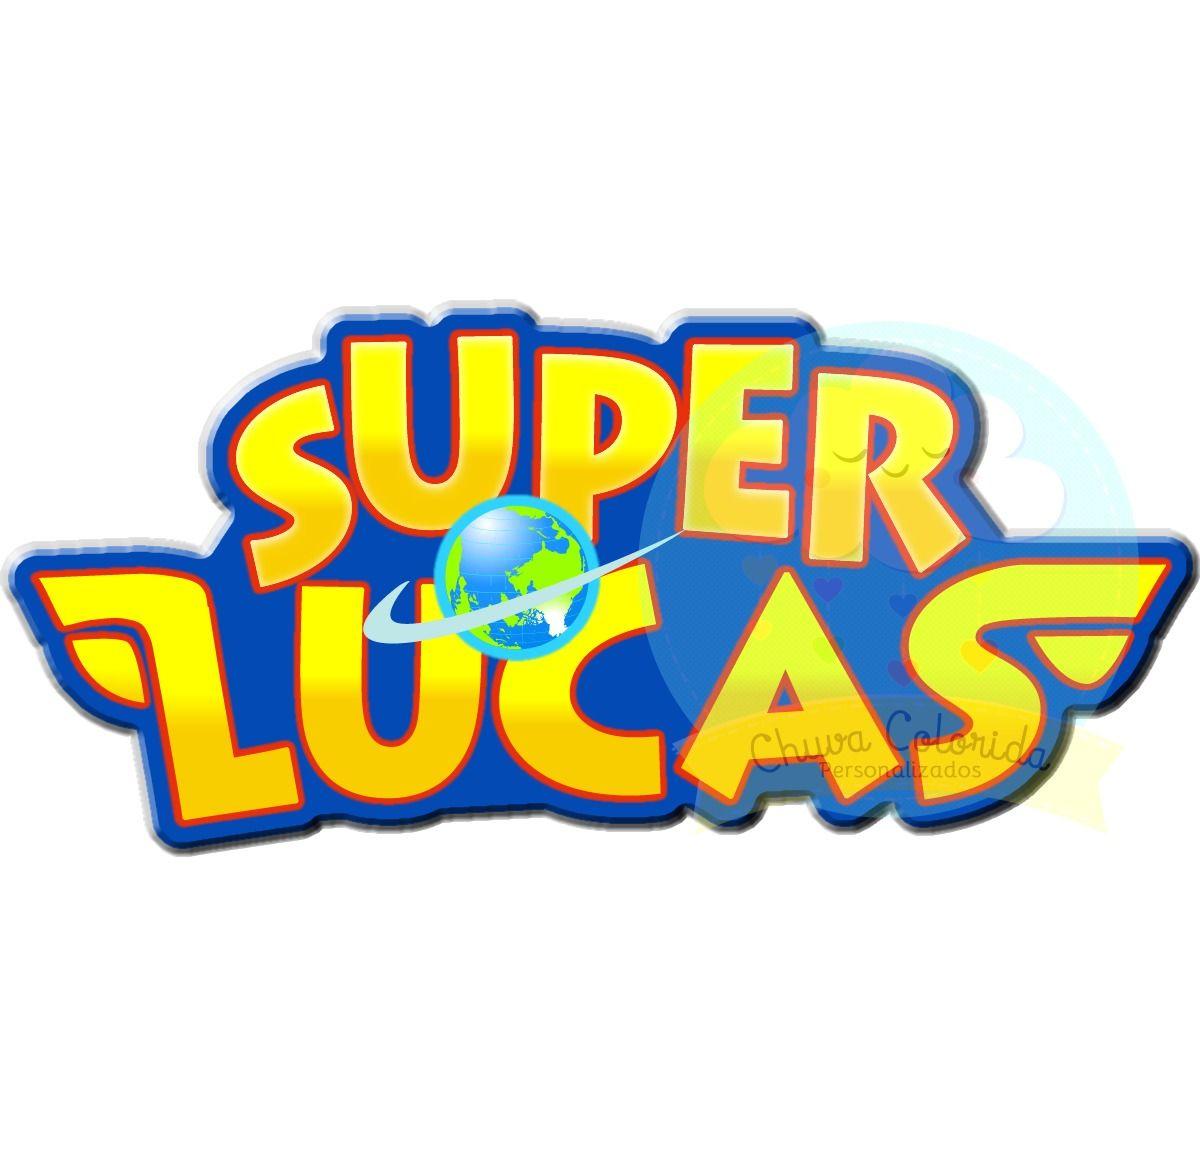 Super R Logo.